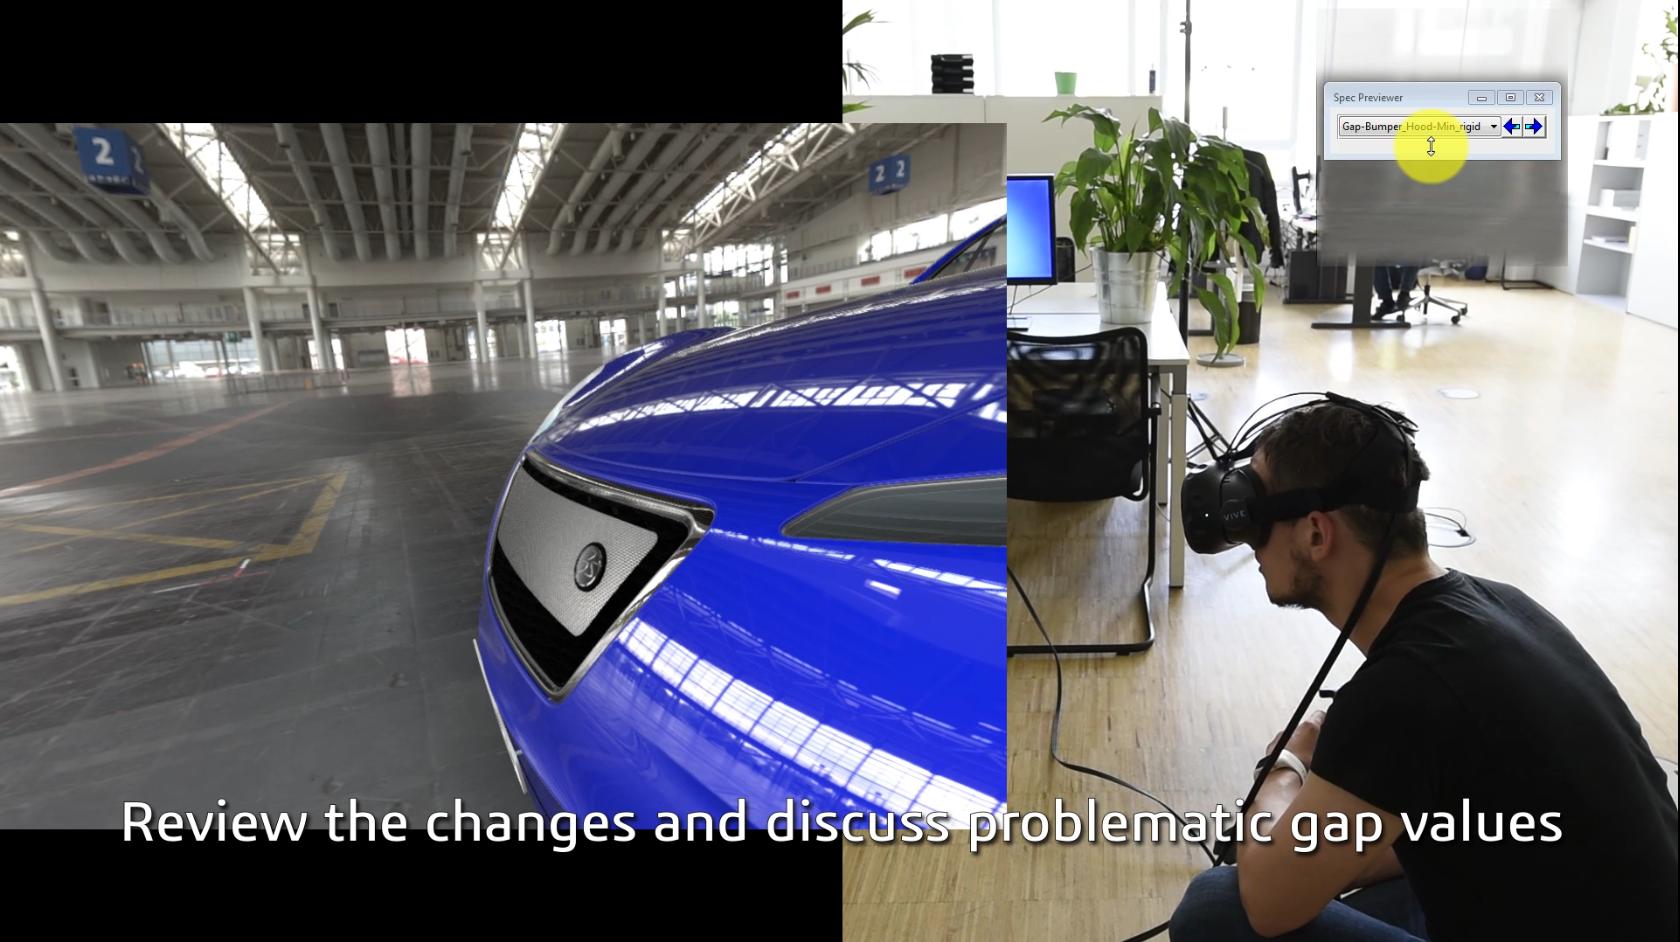 VR-3dexperience-daniel-dresemann-review